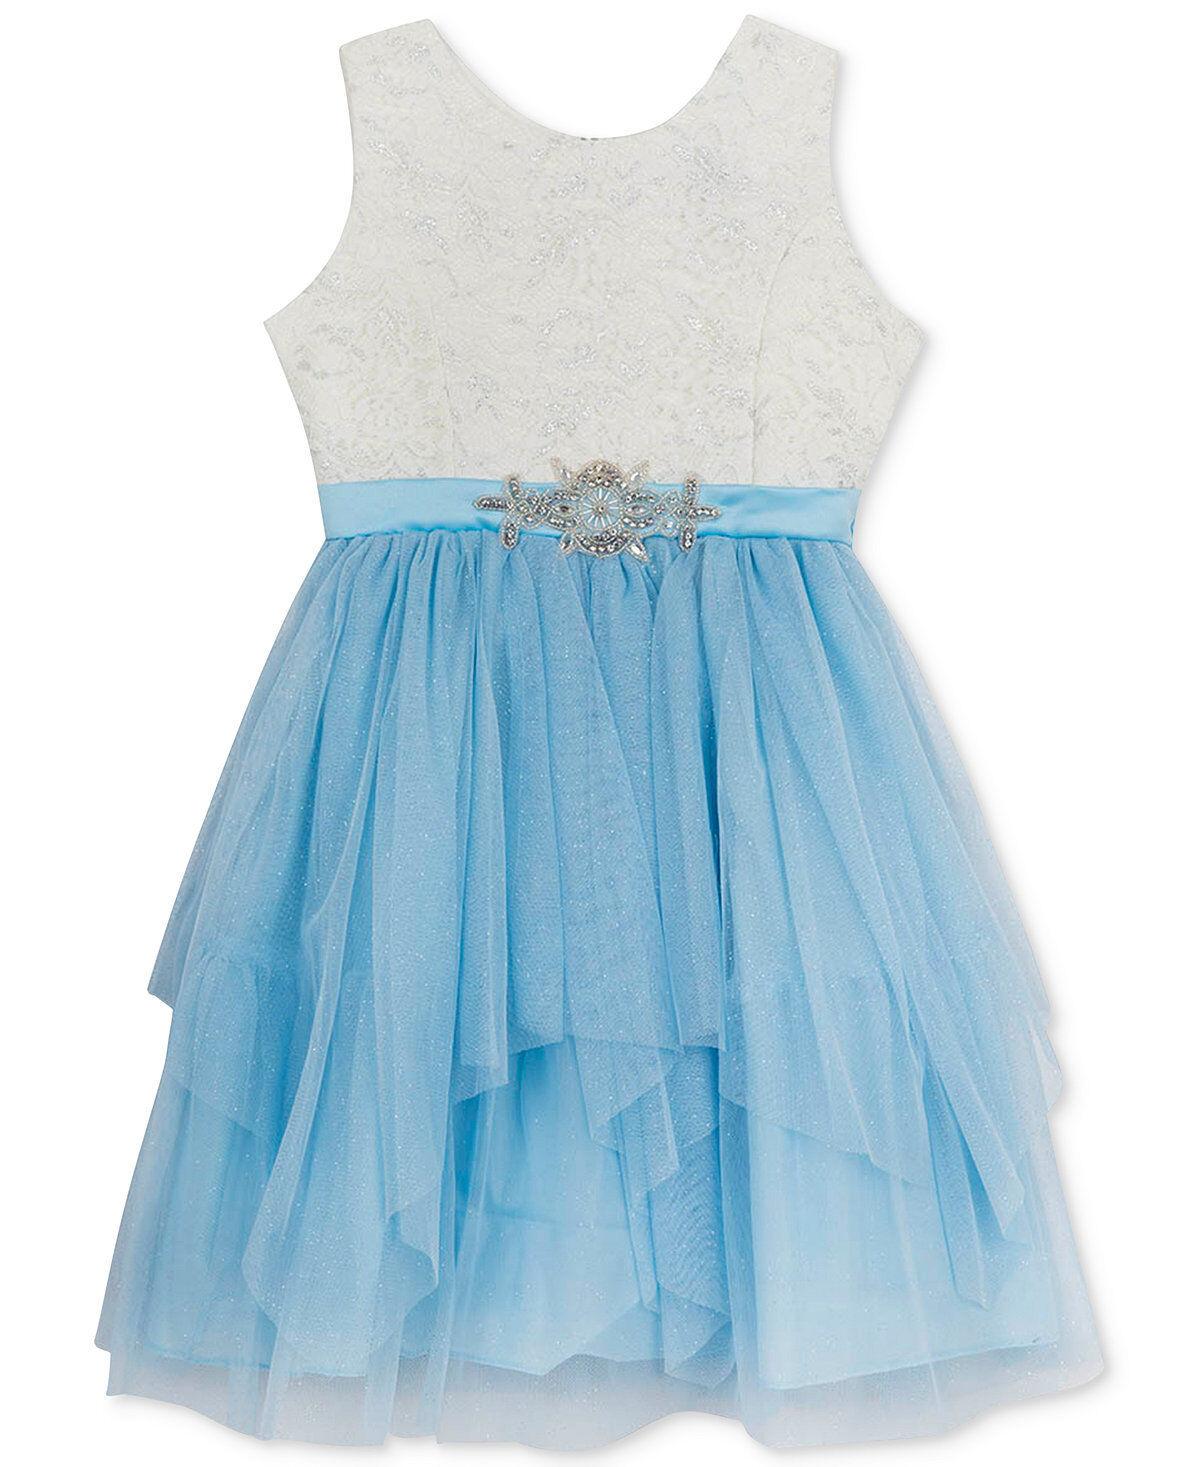 RARE Editions Embellished Lace Dress Big Girls Blue Size 14 Style ...